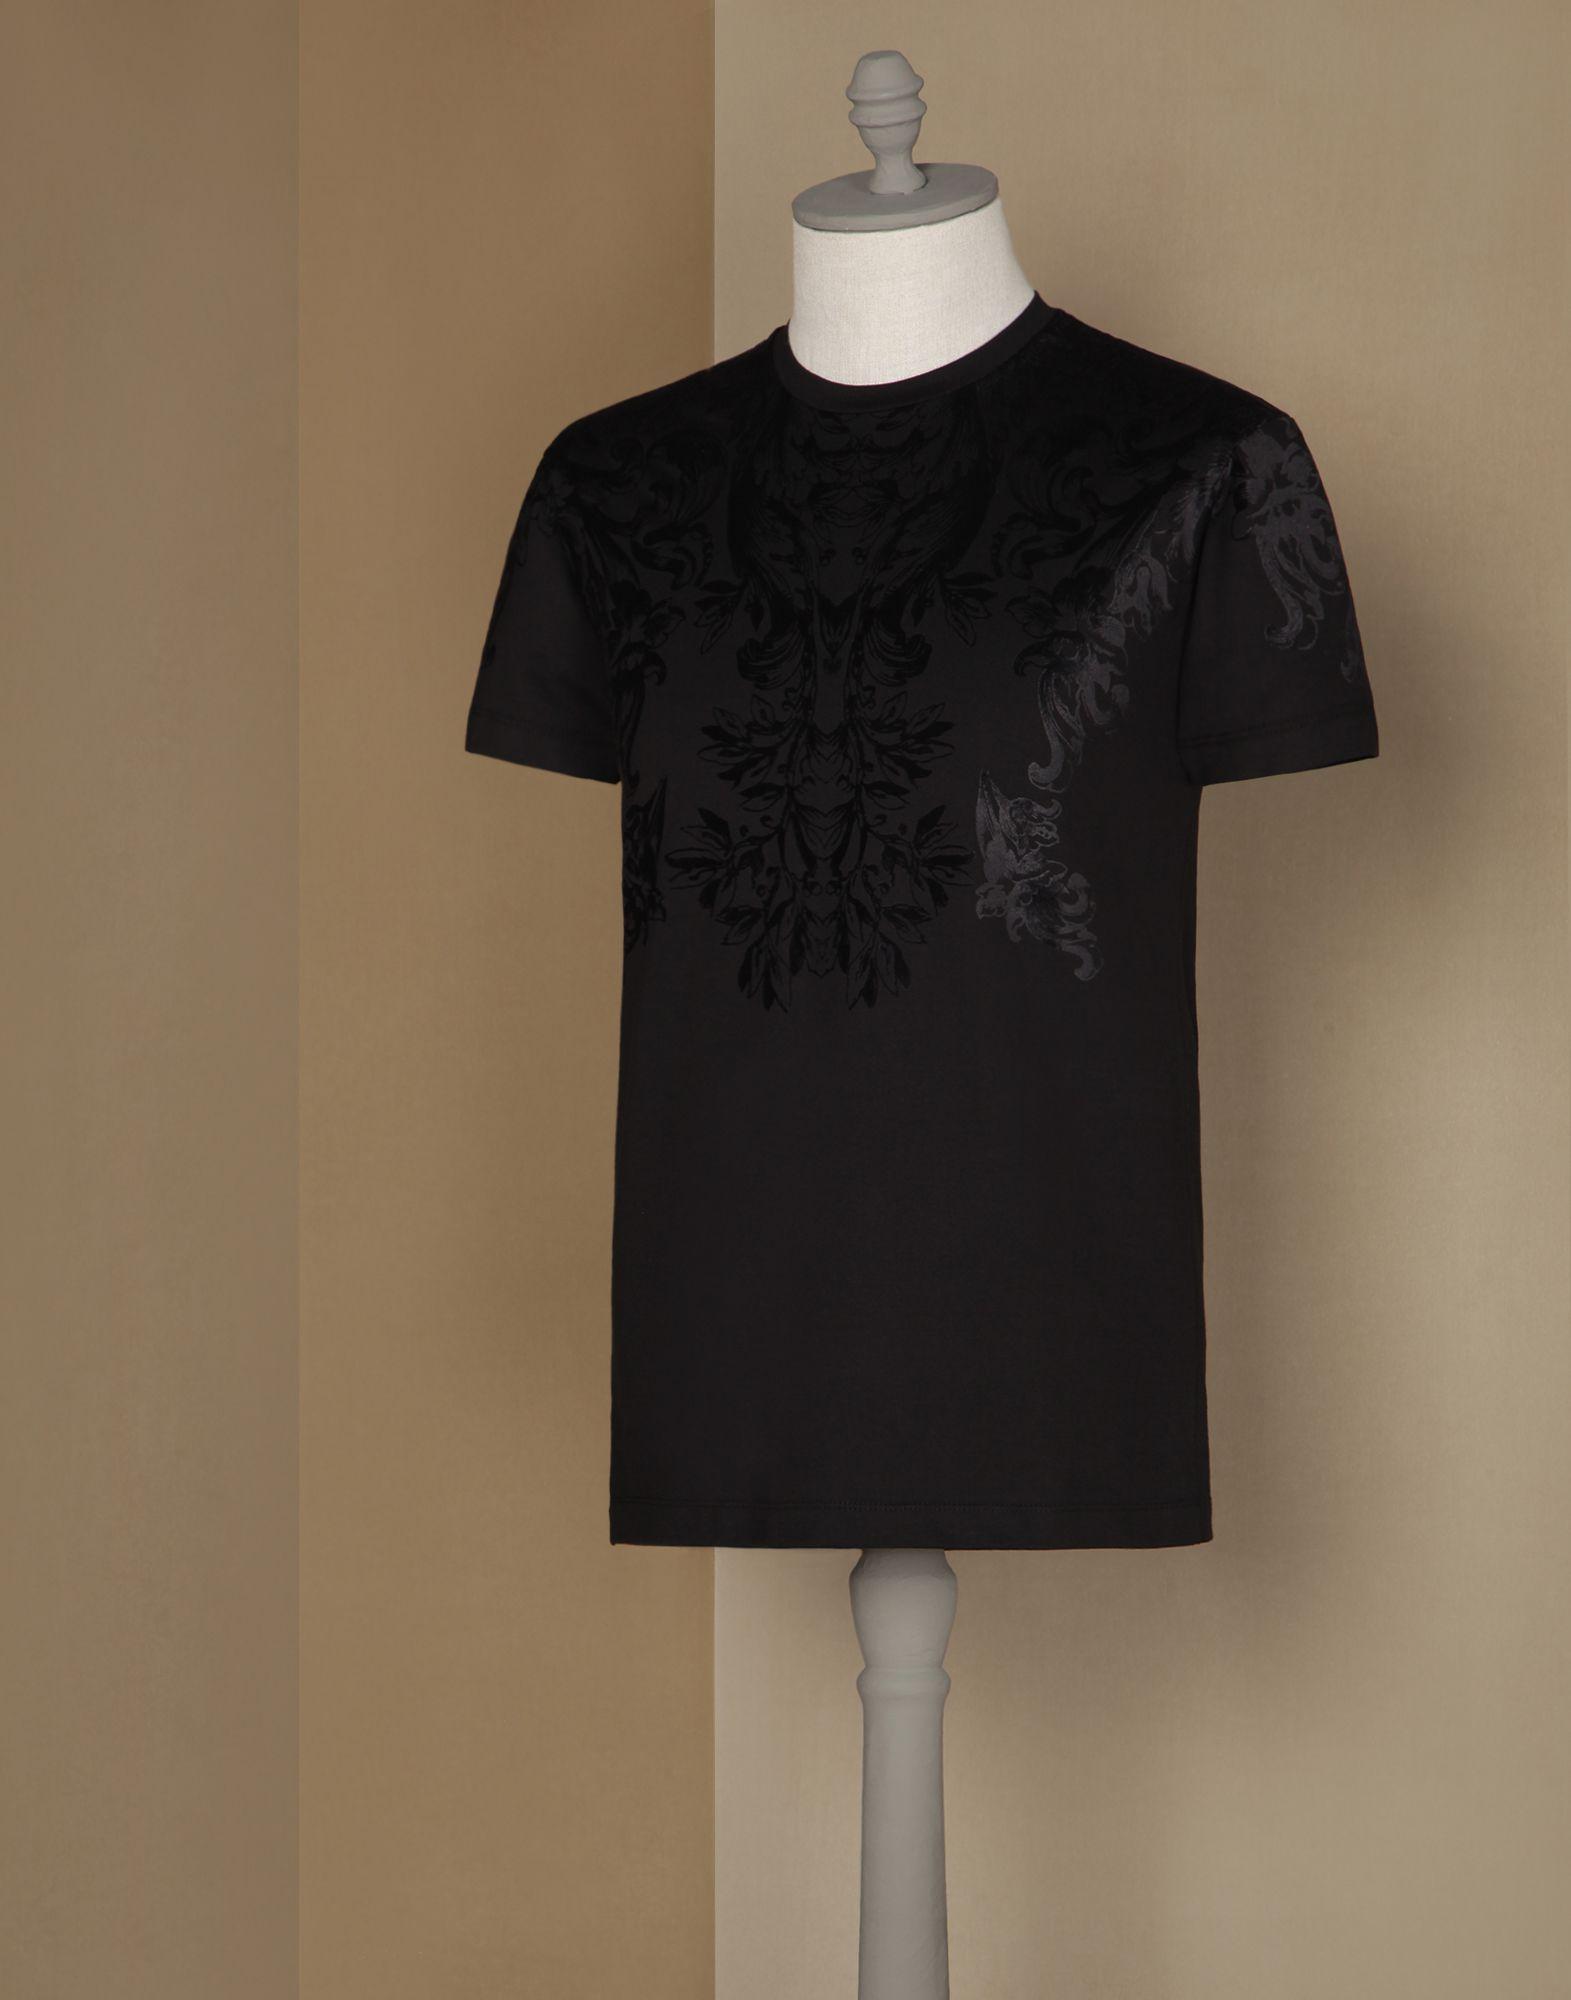 Dolce&Gabbana G8EX6T-G7ZNI Short sleeve t-shirts T-shirts & Polos